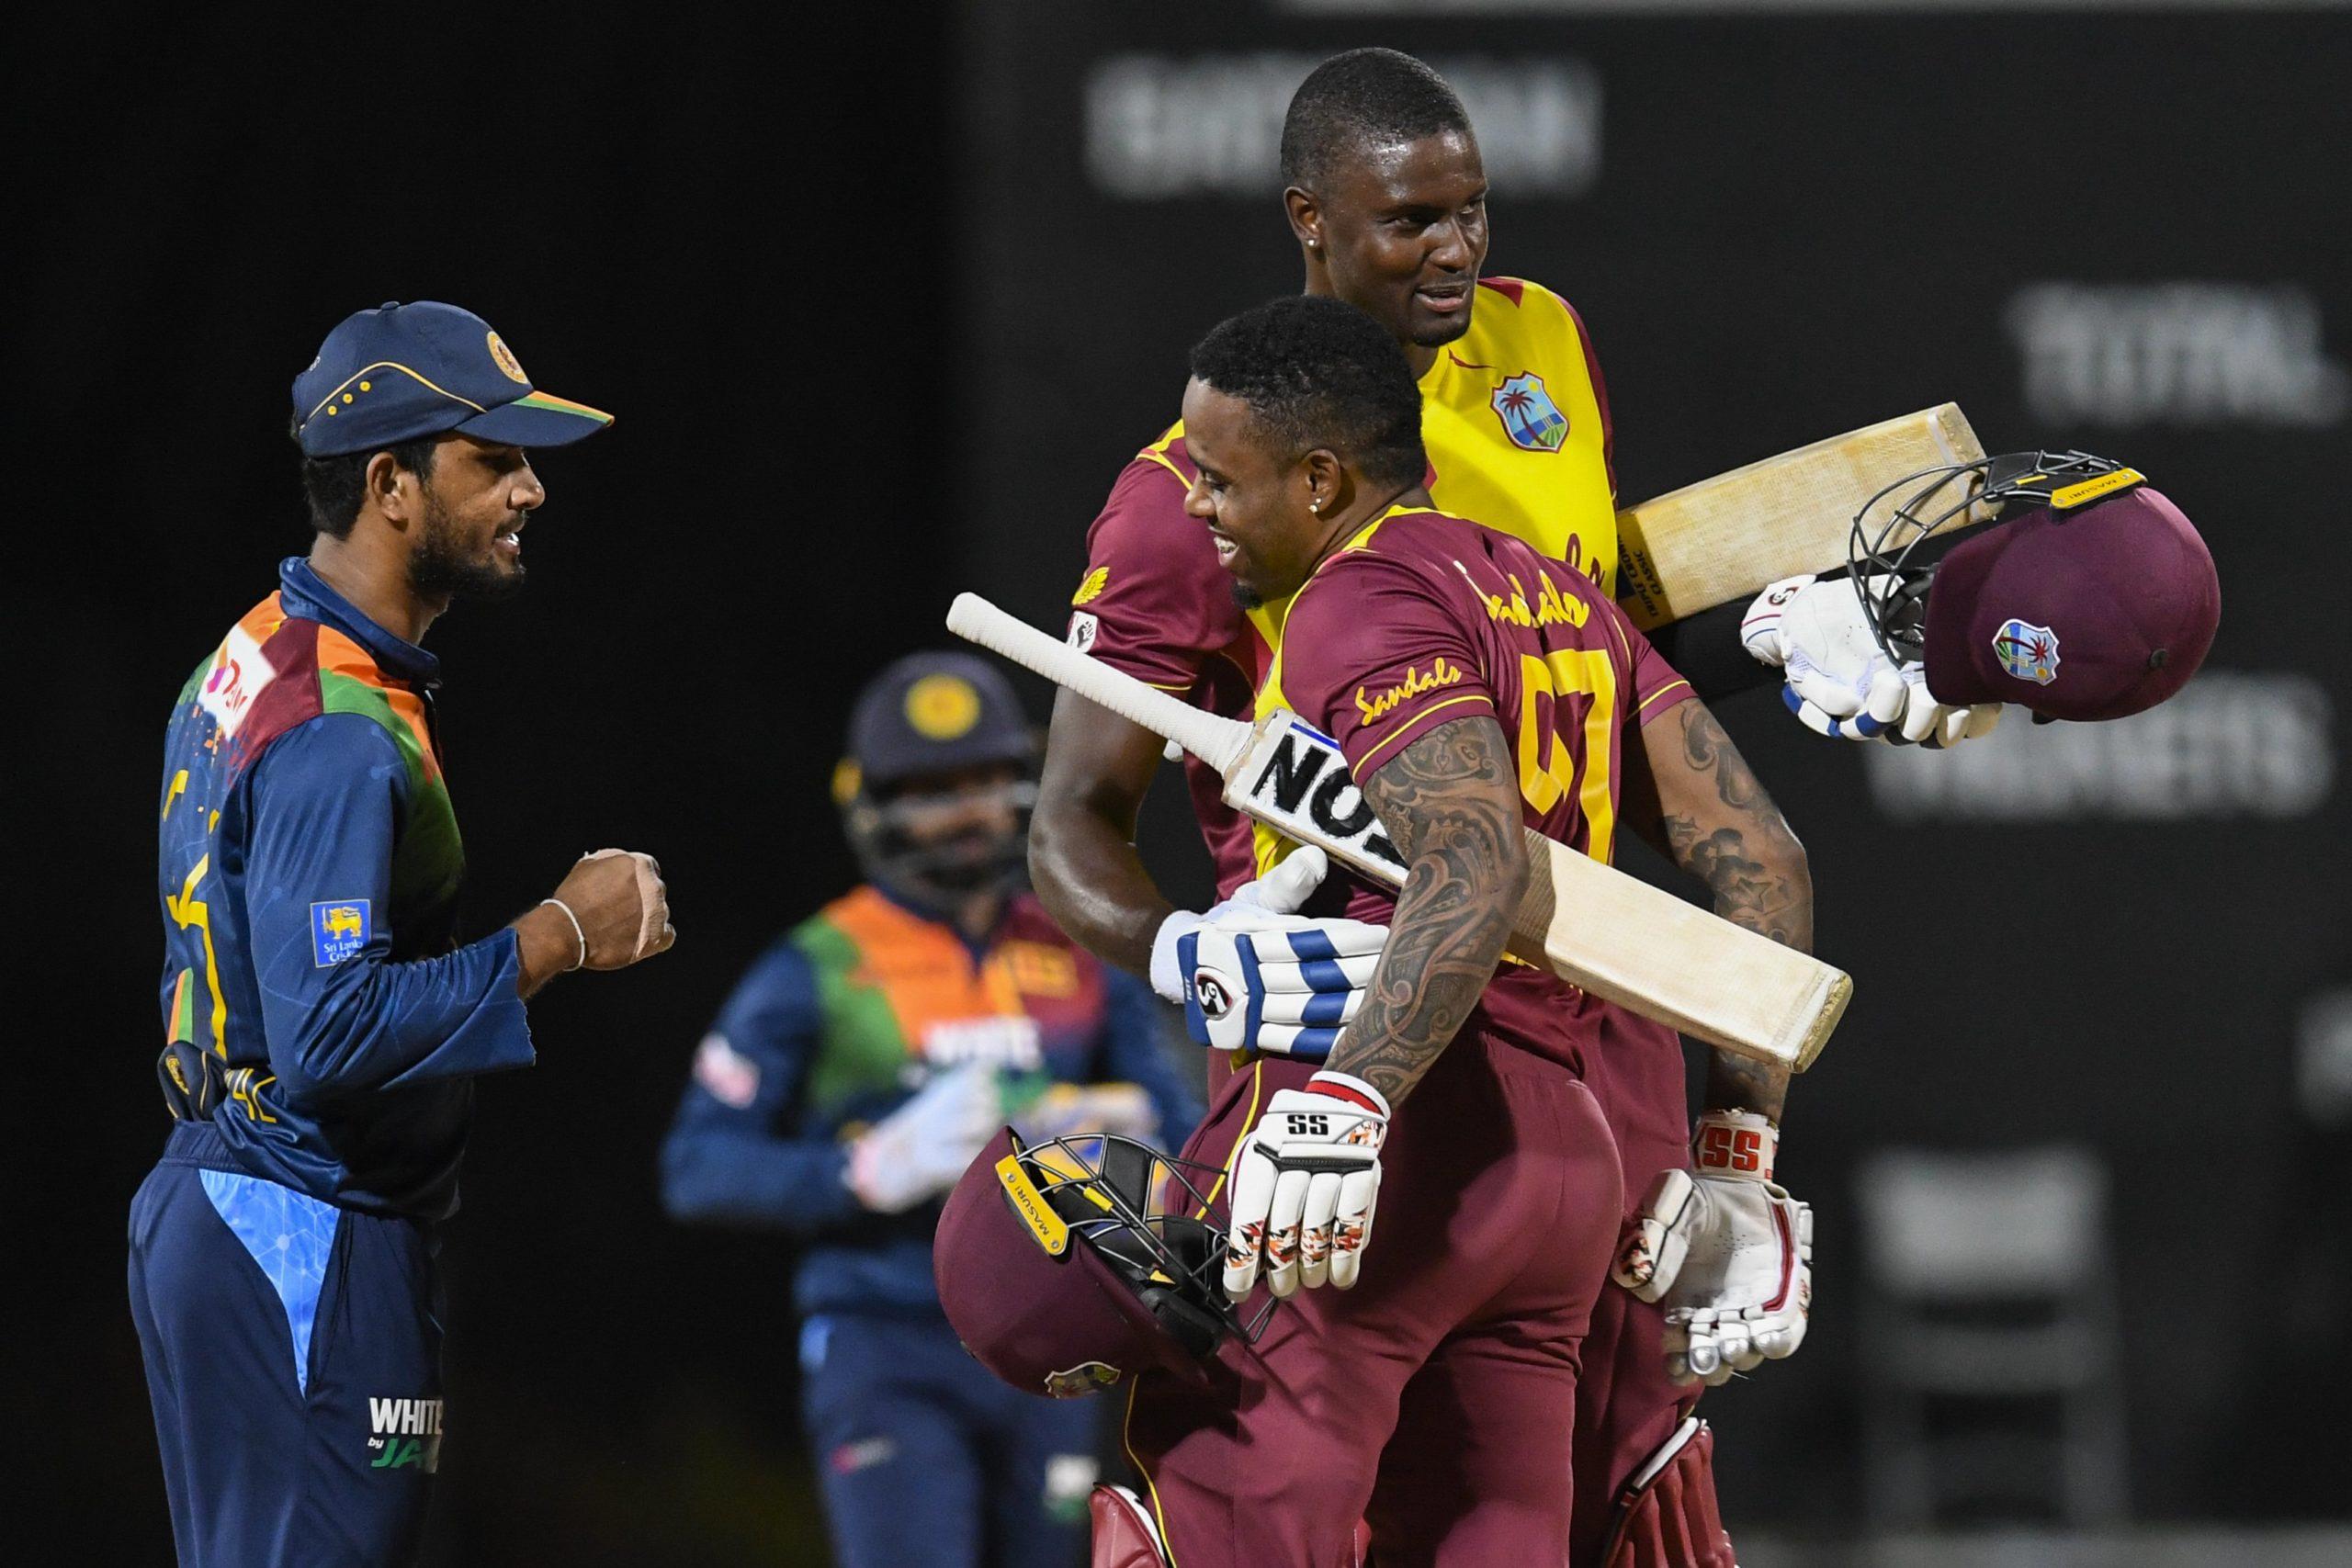 CWI announces West Indies Men's Central Contracts for 2021-2022 season